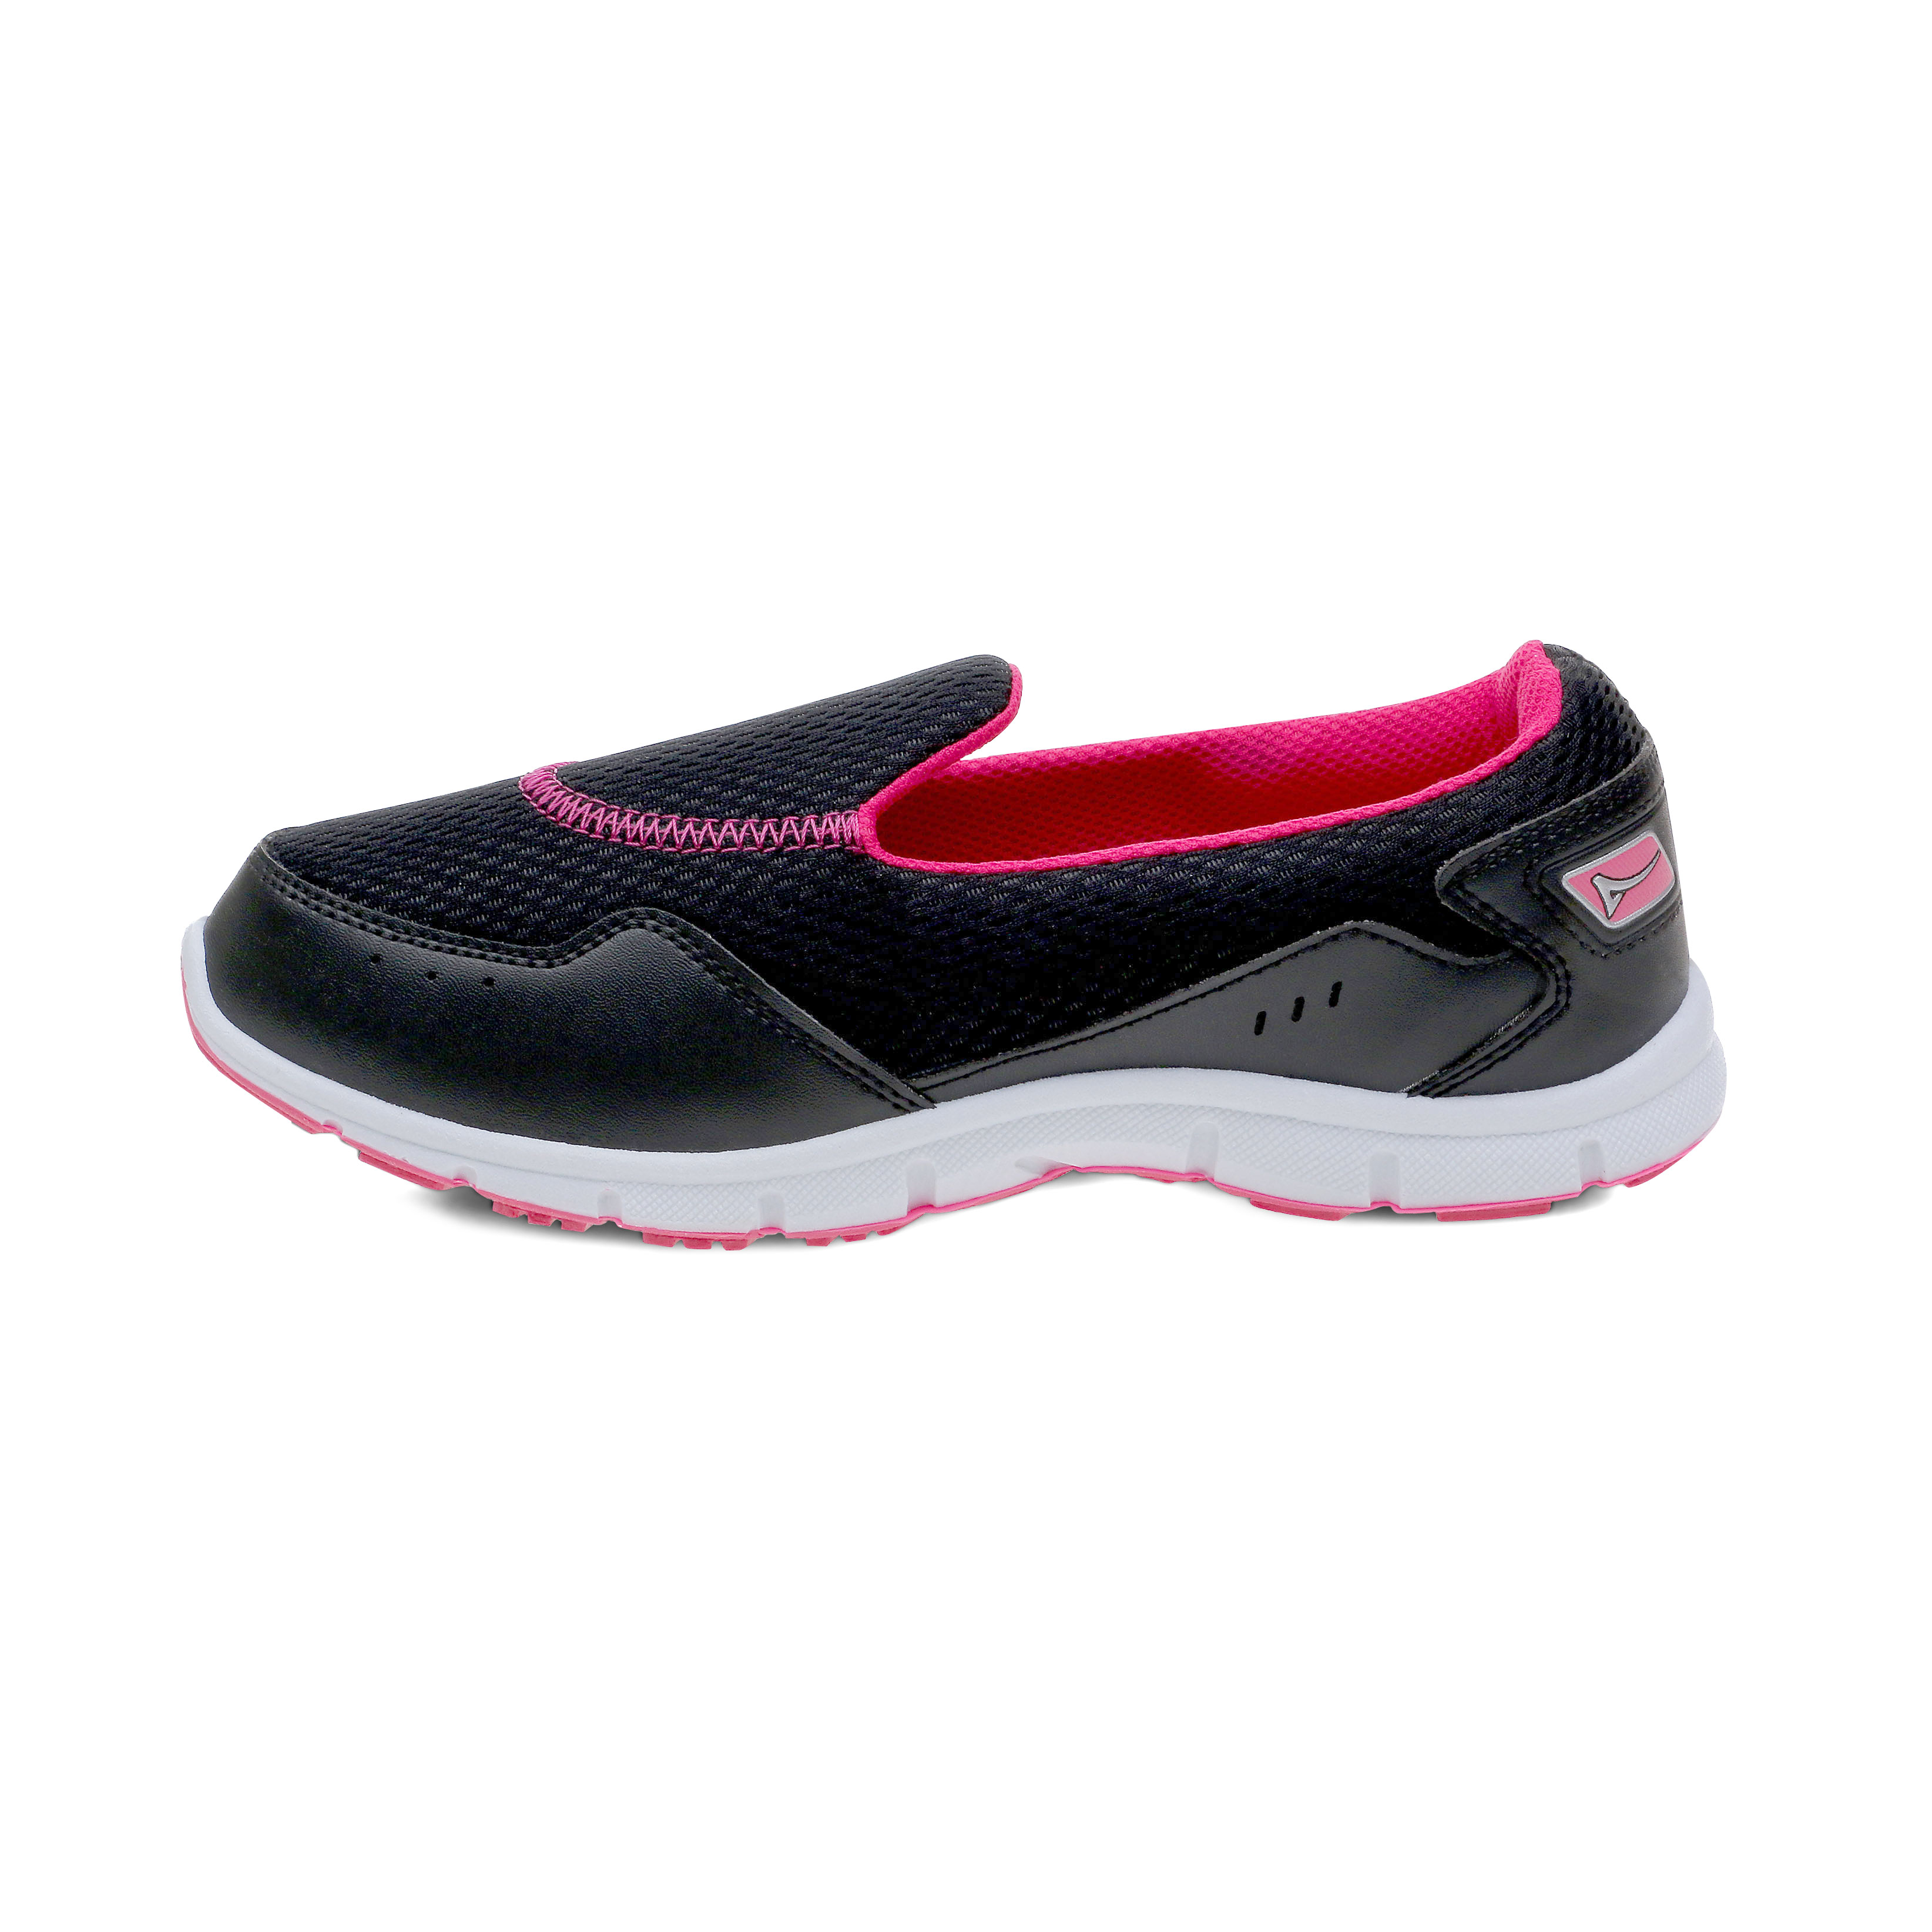 Ardiles Official Shop Line Men Money Vesto Sepatu Slip On Hitam 42 Majolica Women Sneakers